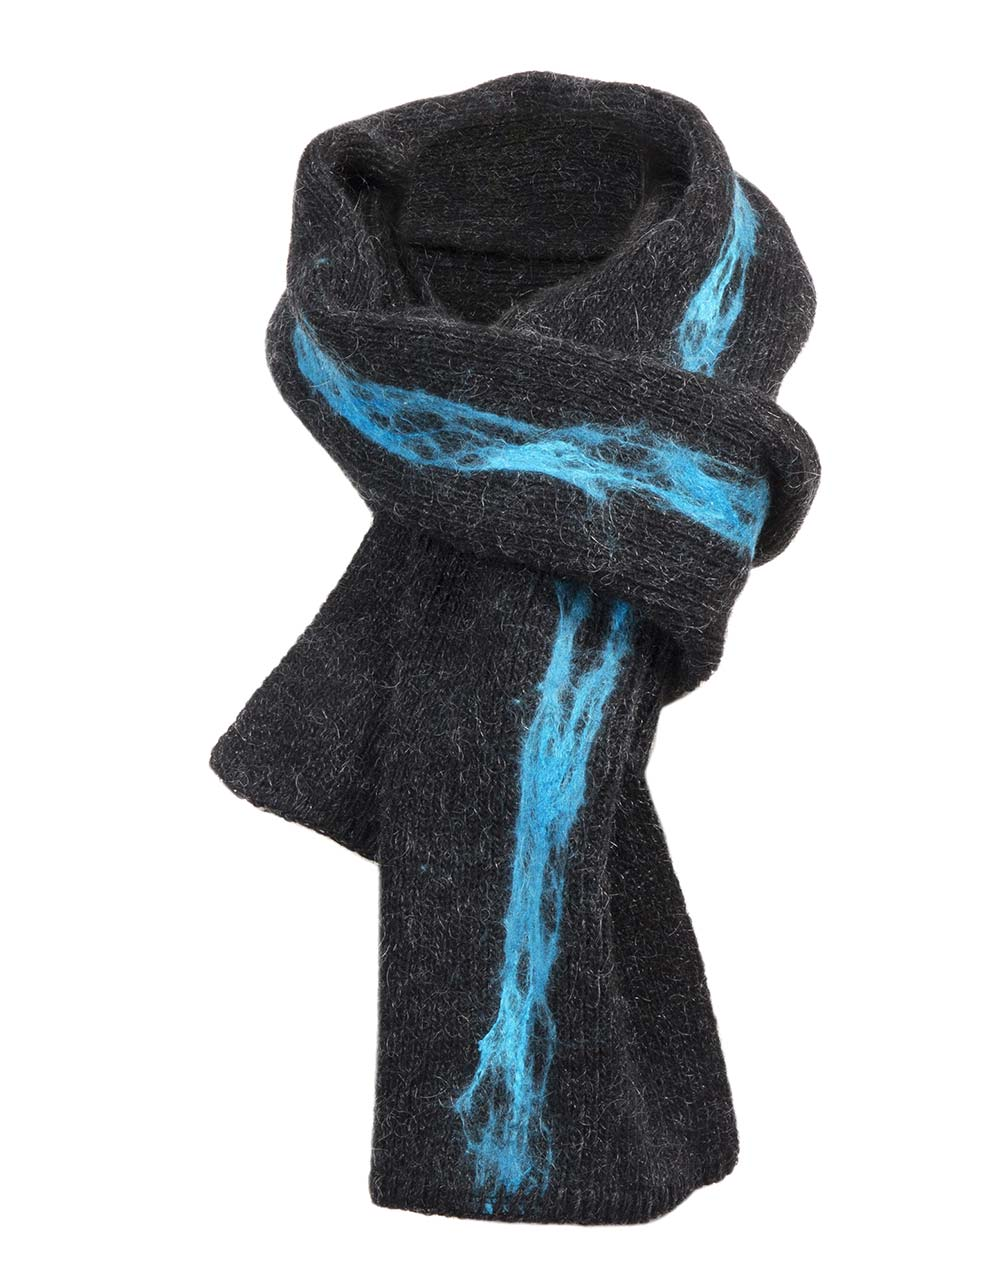 glacier scarf, gjoska.is